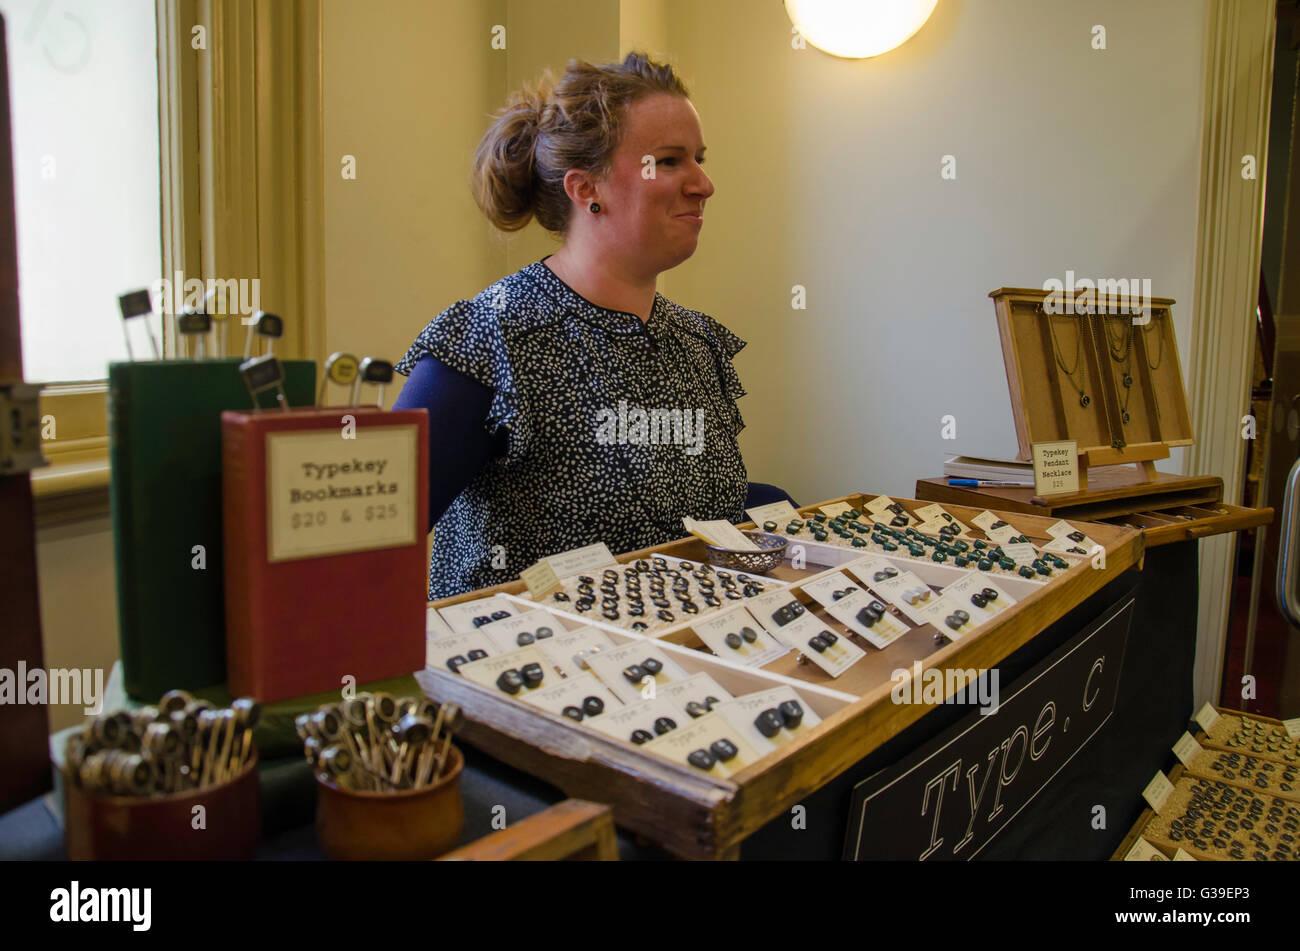 Type C Typewriters Reincarnated stall at The Creators Market in Prahran in Melbourne Australia - Stock Image